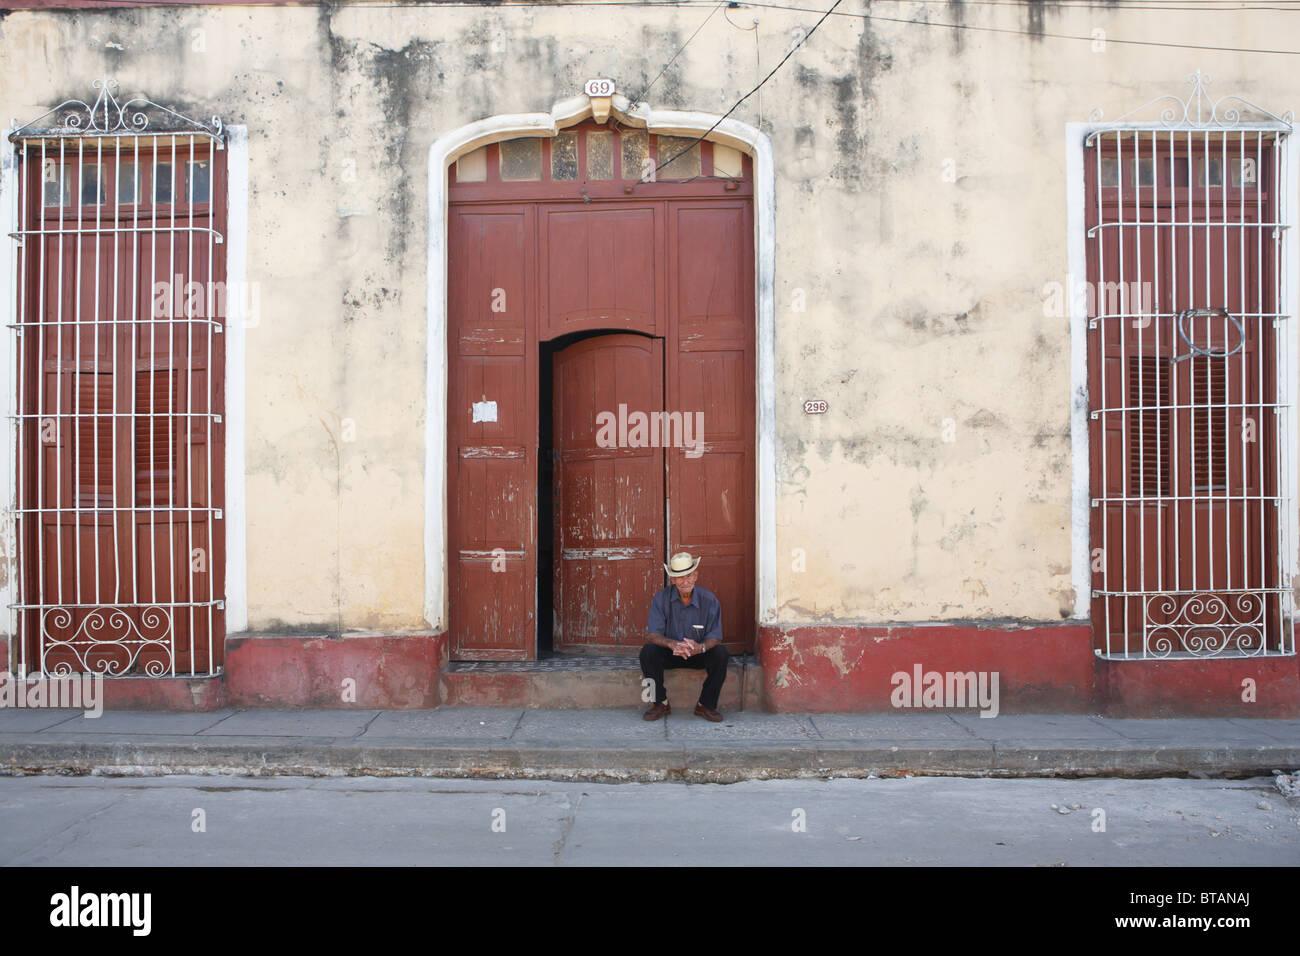 TRINIDAD: CUBAN MAN SITTING IN DOORWAY - Stock Image